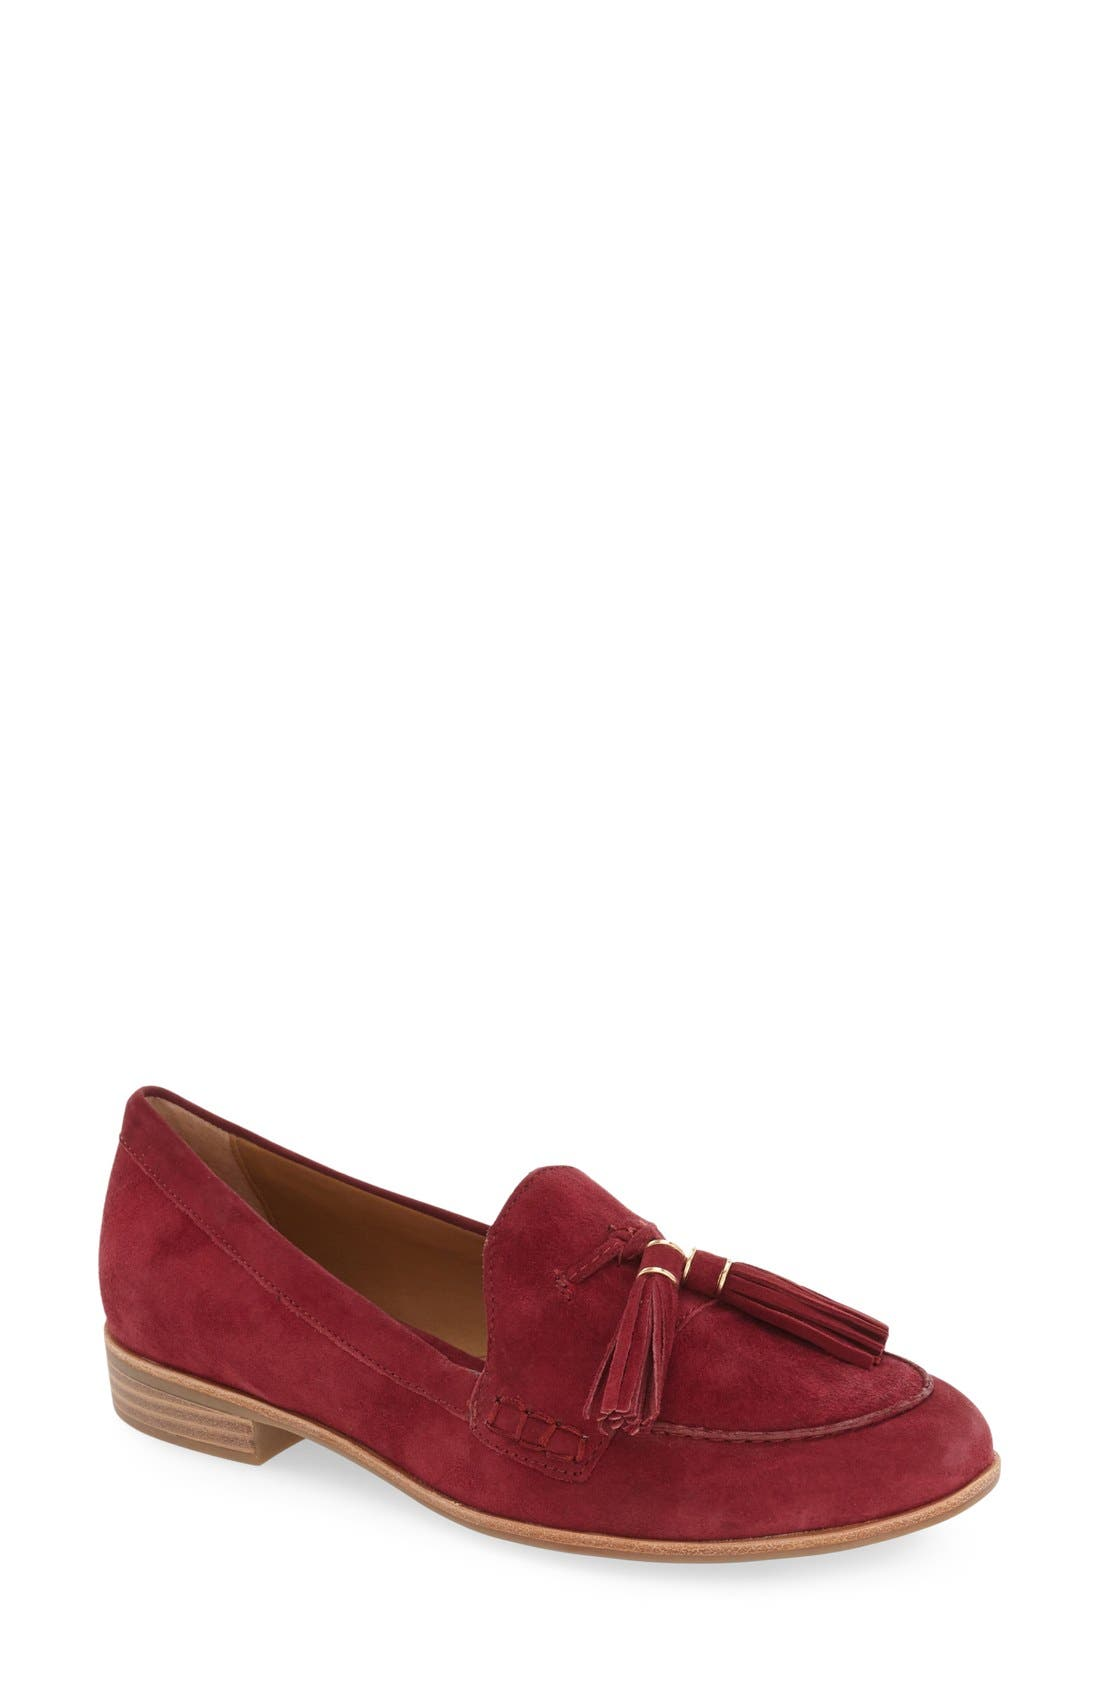 'Estelle' Tassel Loafer,                         Main,                         color, Cherry Red Suede